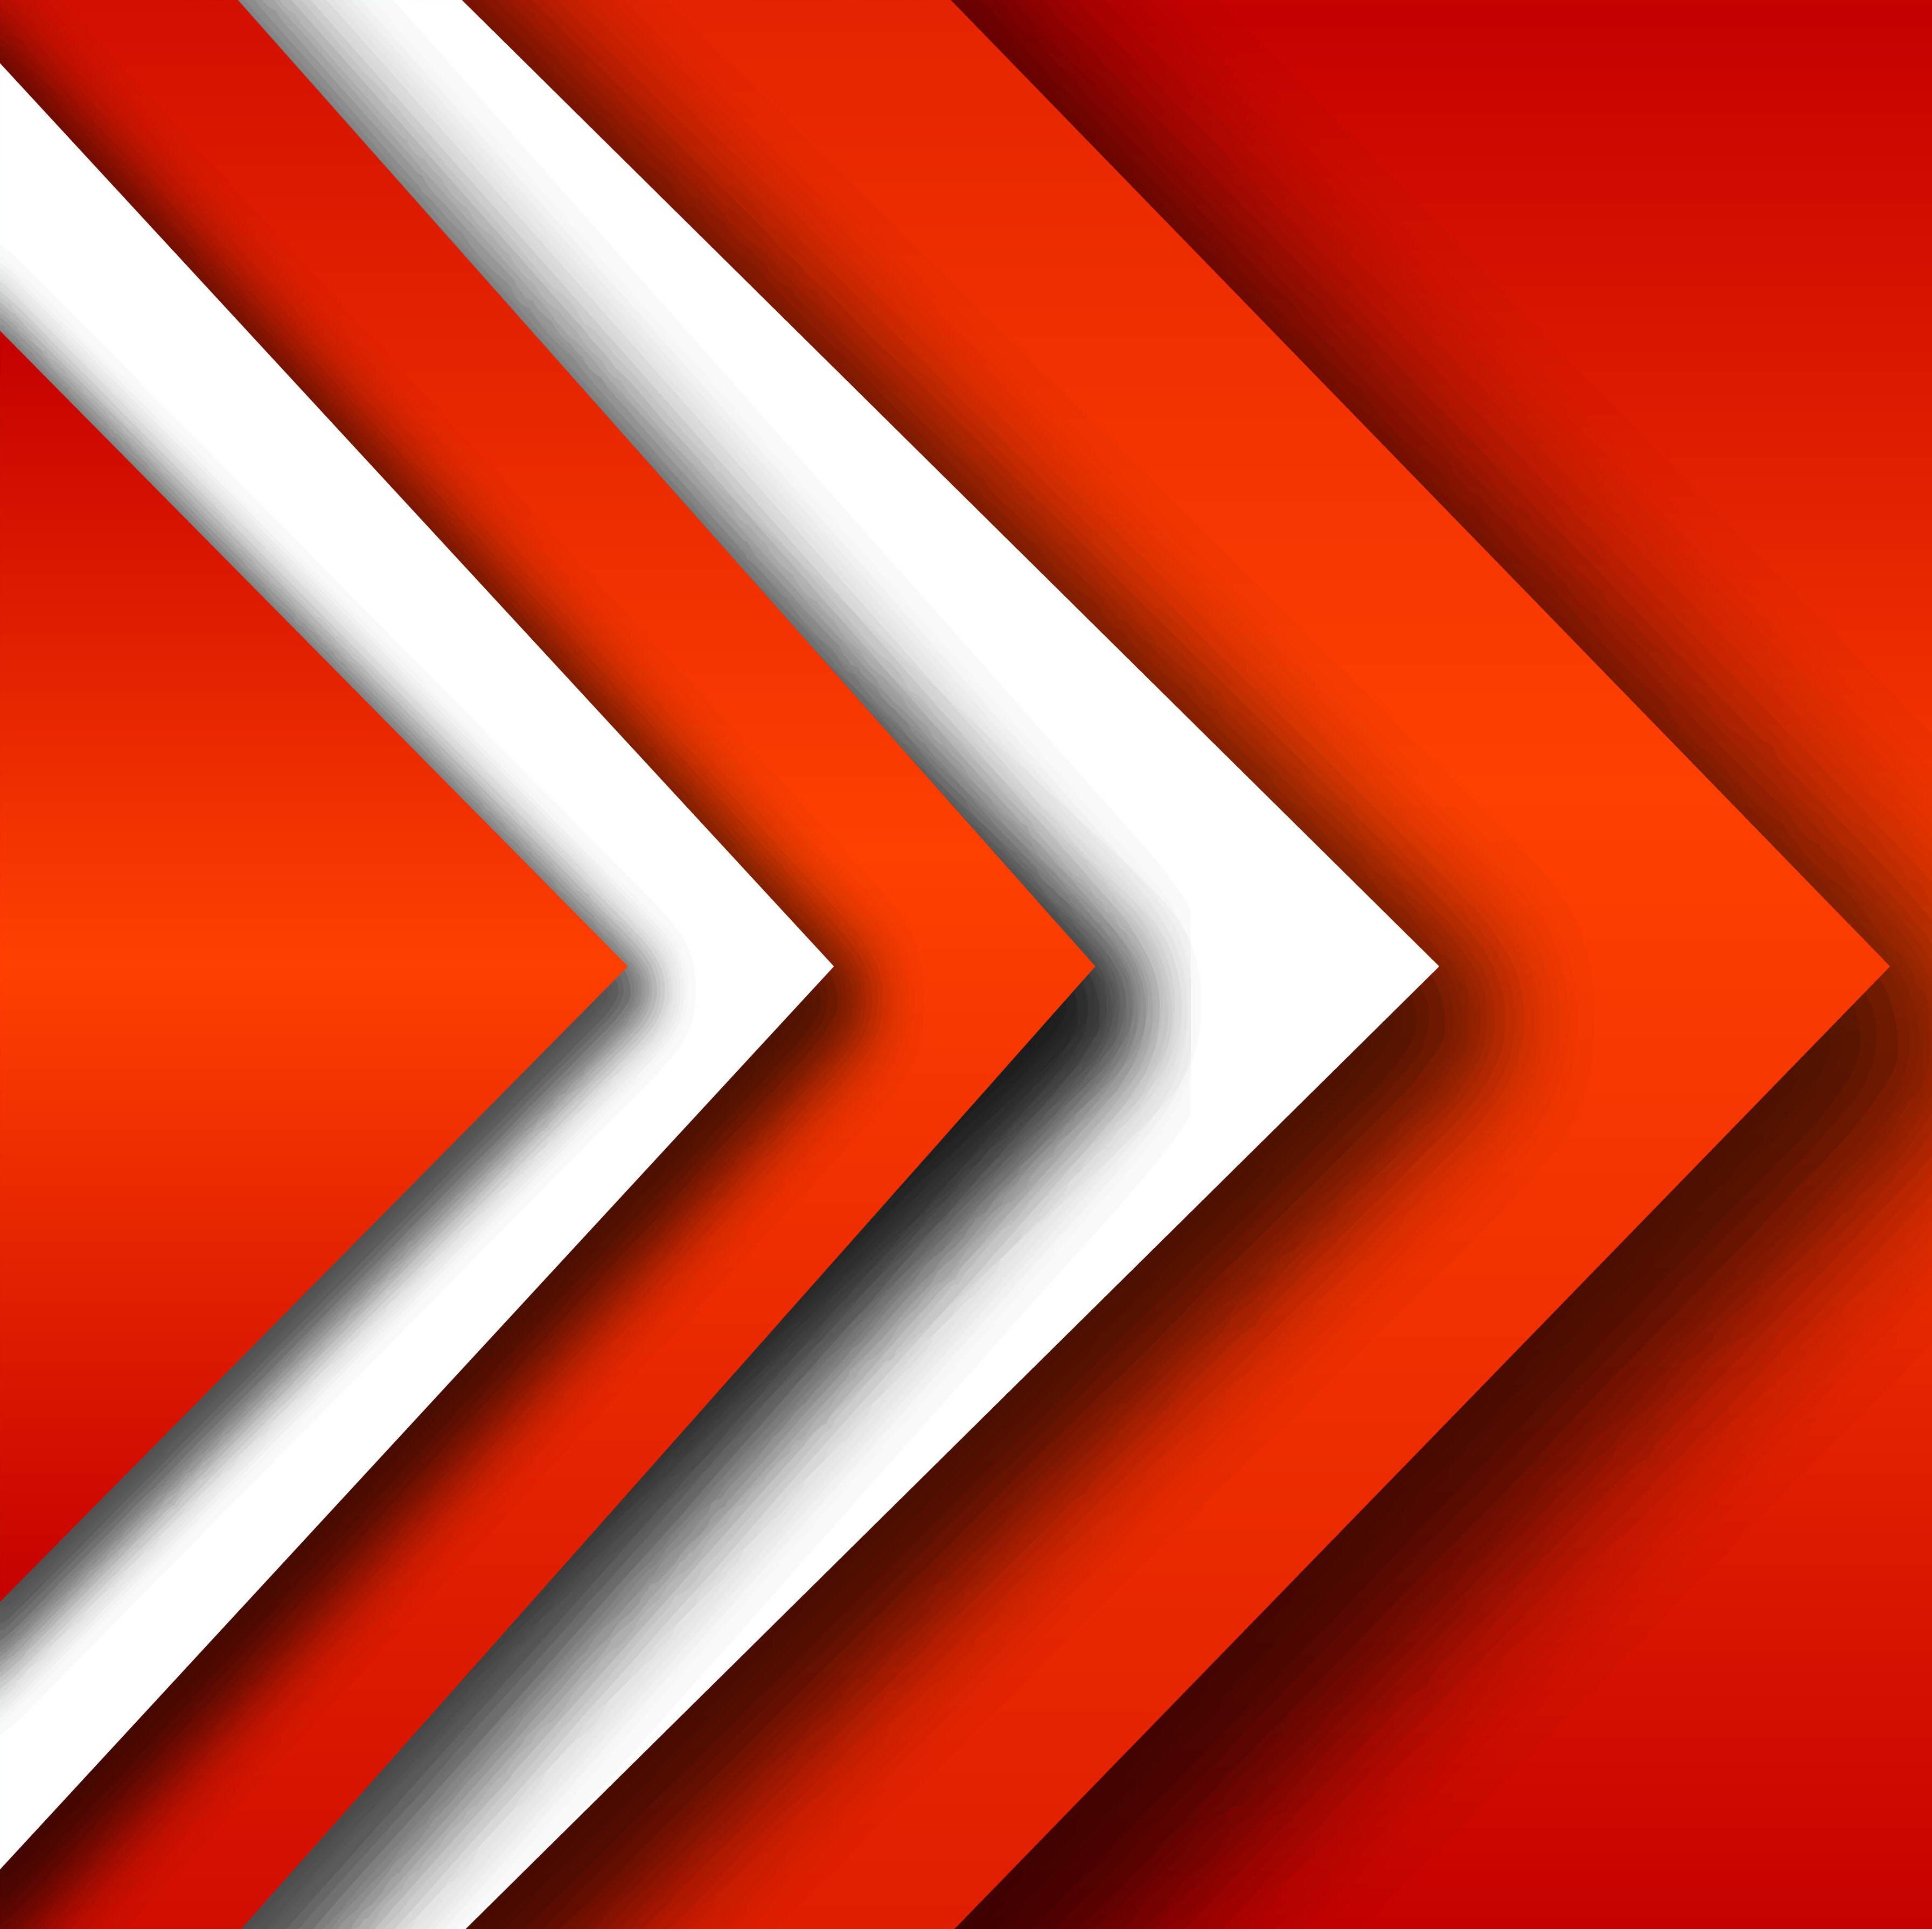 Modern Stylish Geometric Red Background Vector 241317